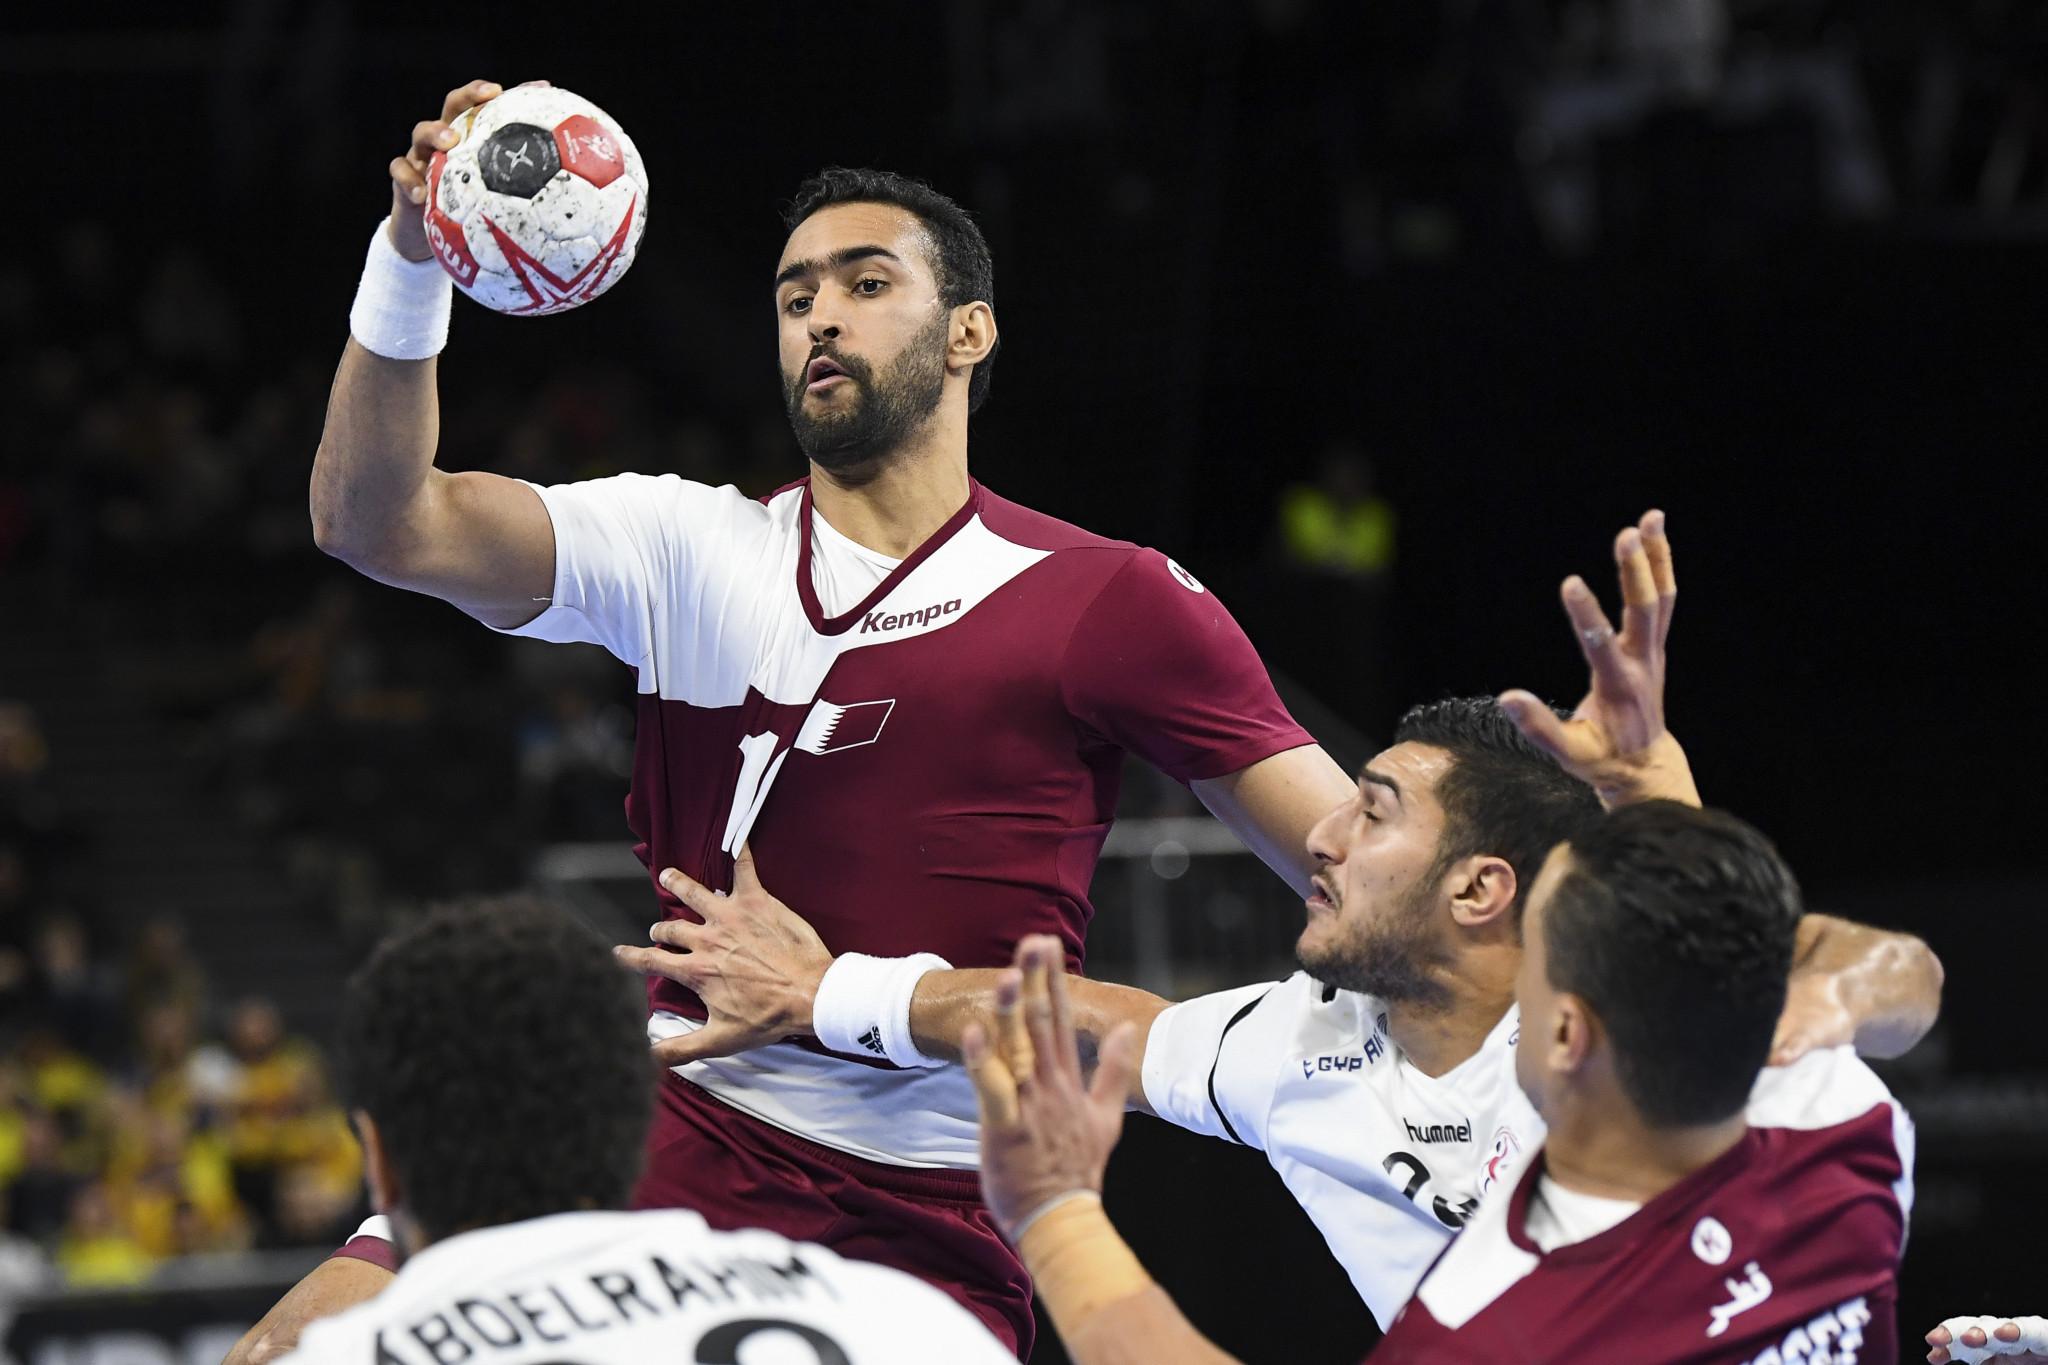 Qatar Handball Association announces new tournament for continental champion teams